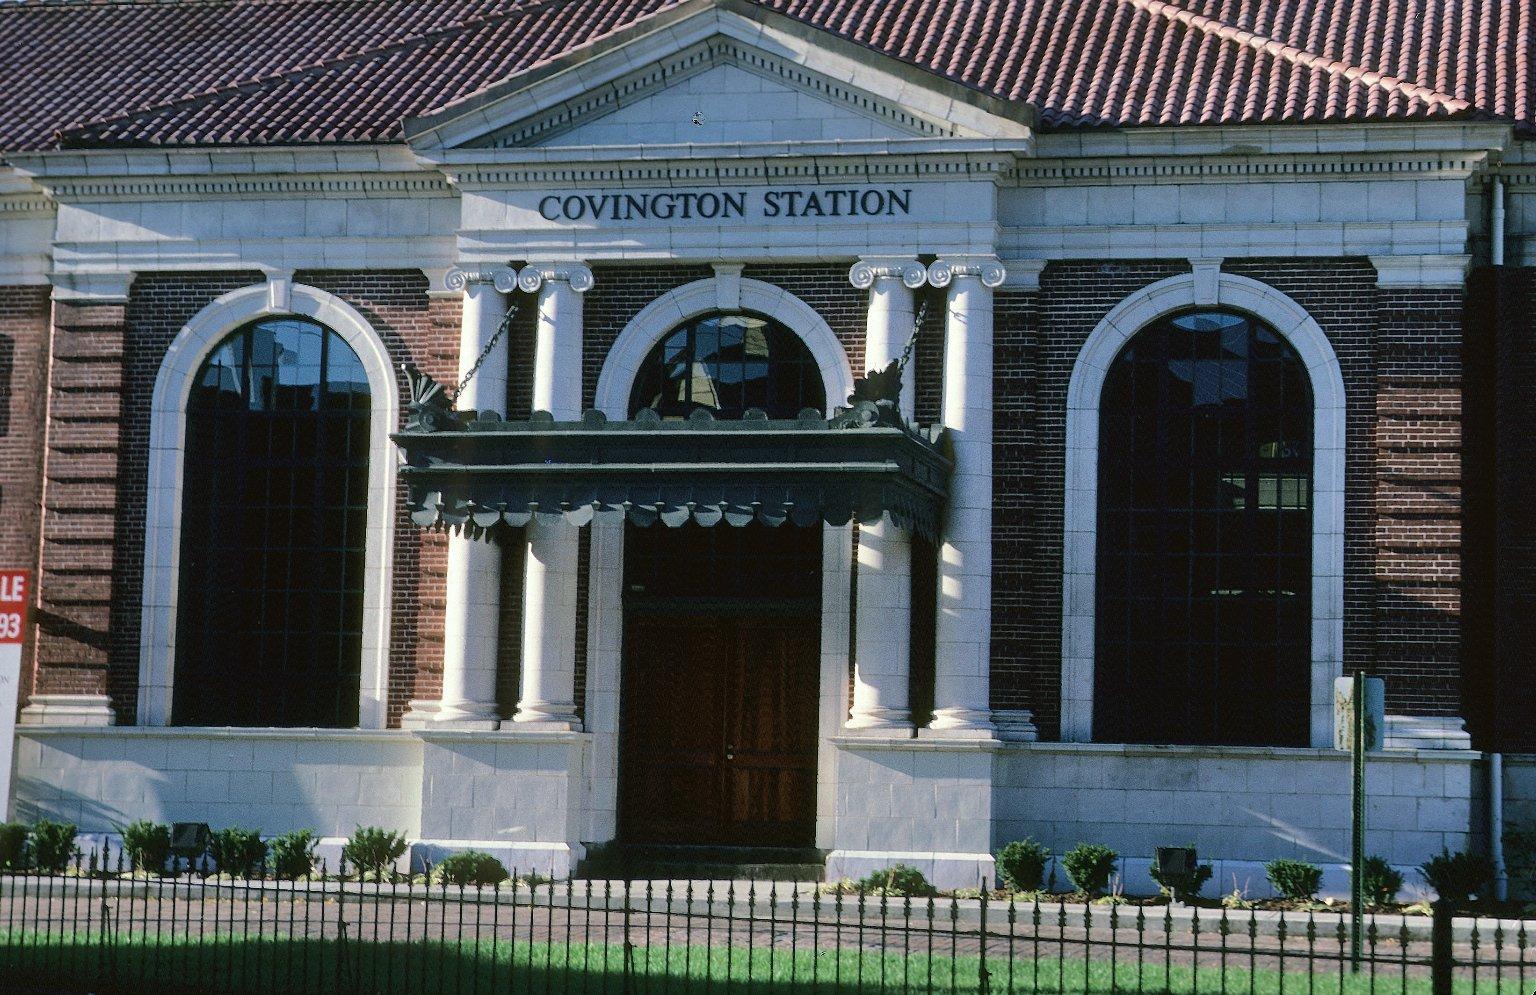 Covington Station